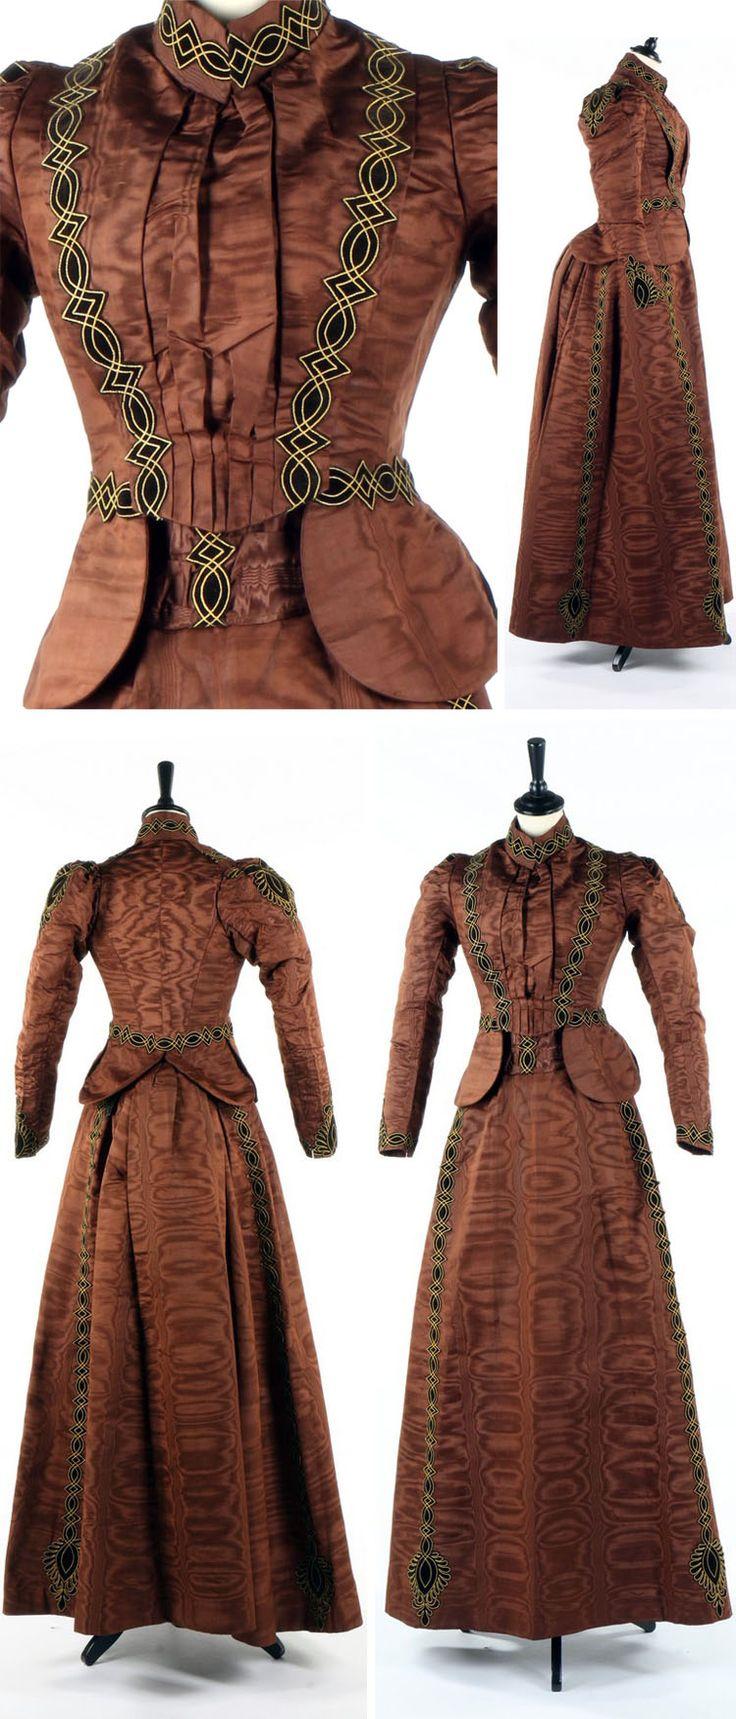 Brown moiré dress ca. 1890. Comprises bodice, skirt, cummerbund with appliquéd velvet strapwork, and silk camisole. Kerry Taylor Auctions